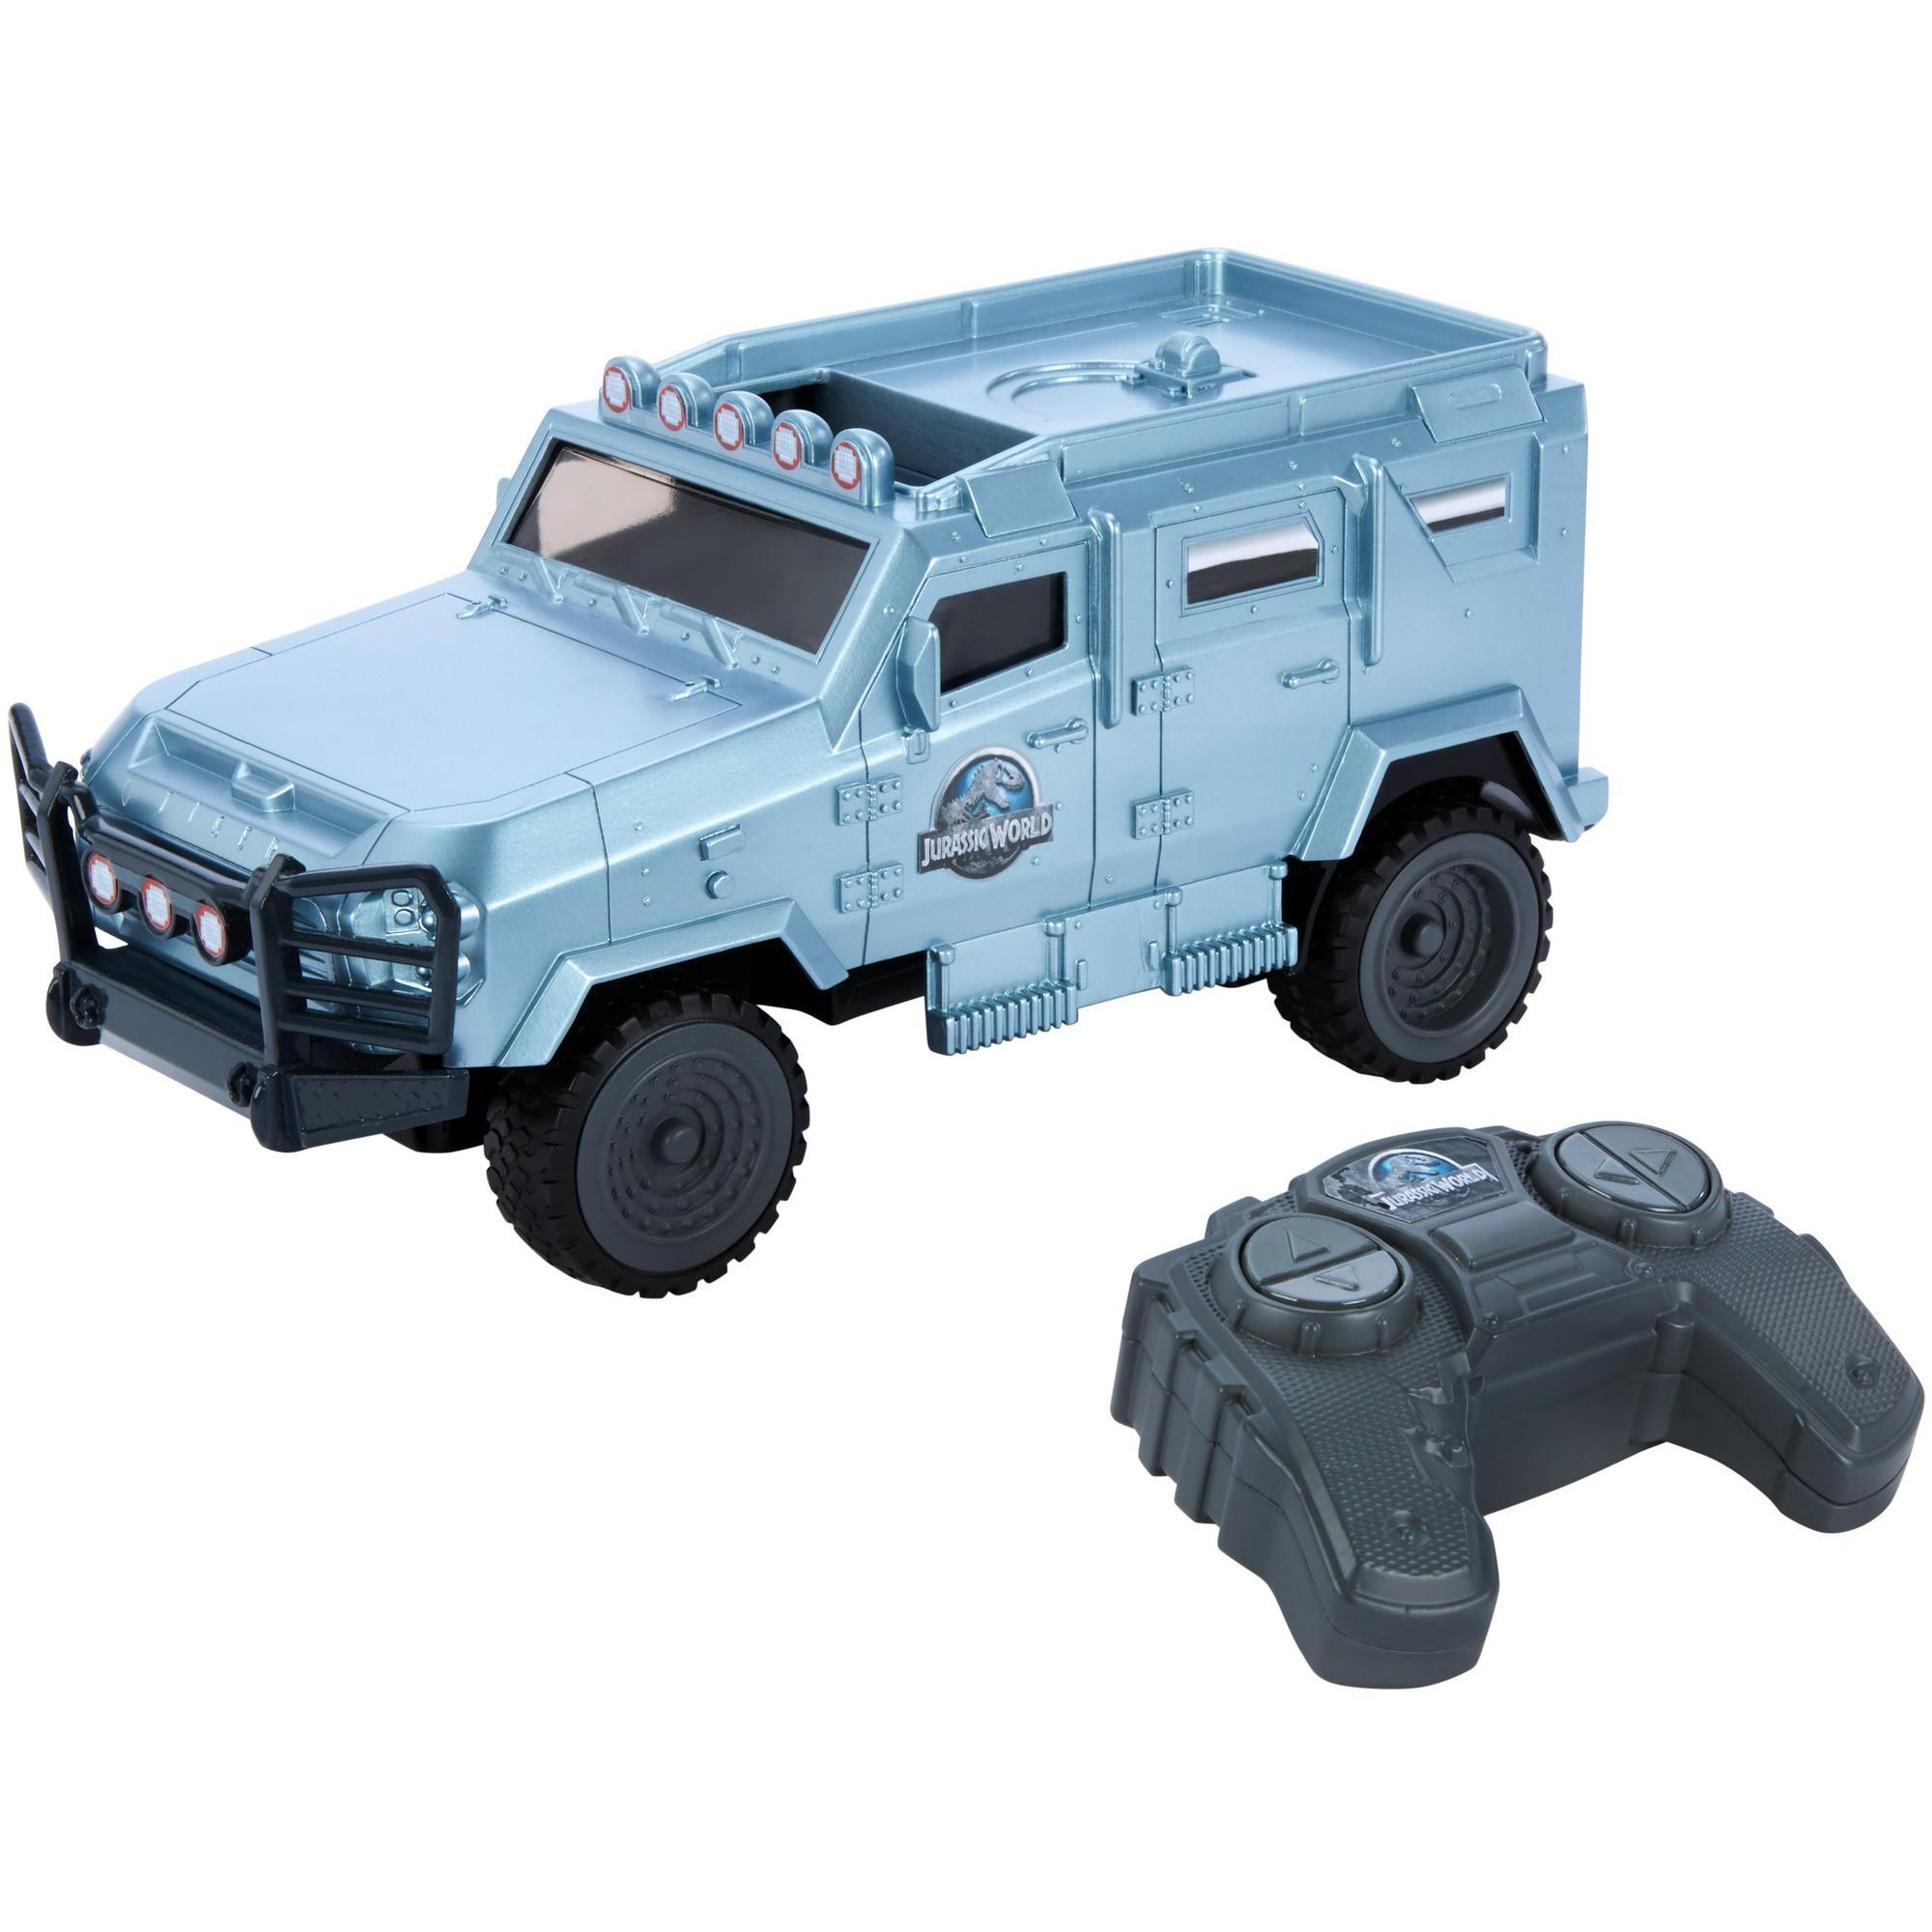 Matchbox Jurassic World MDT Tiger Light Protected RC Vehicle